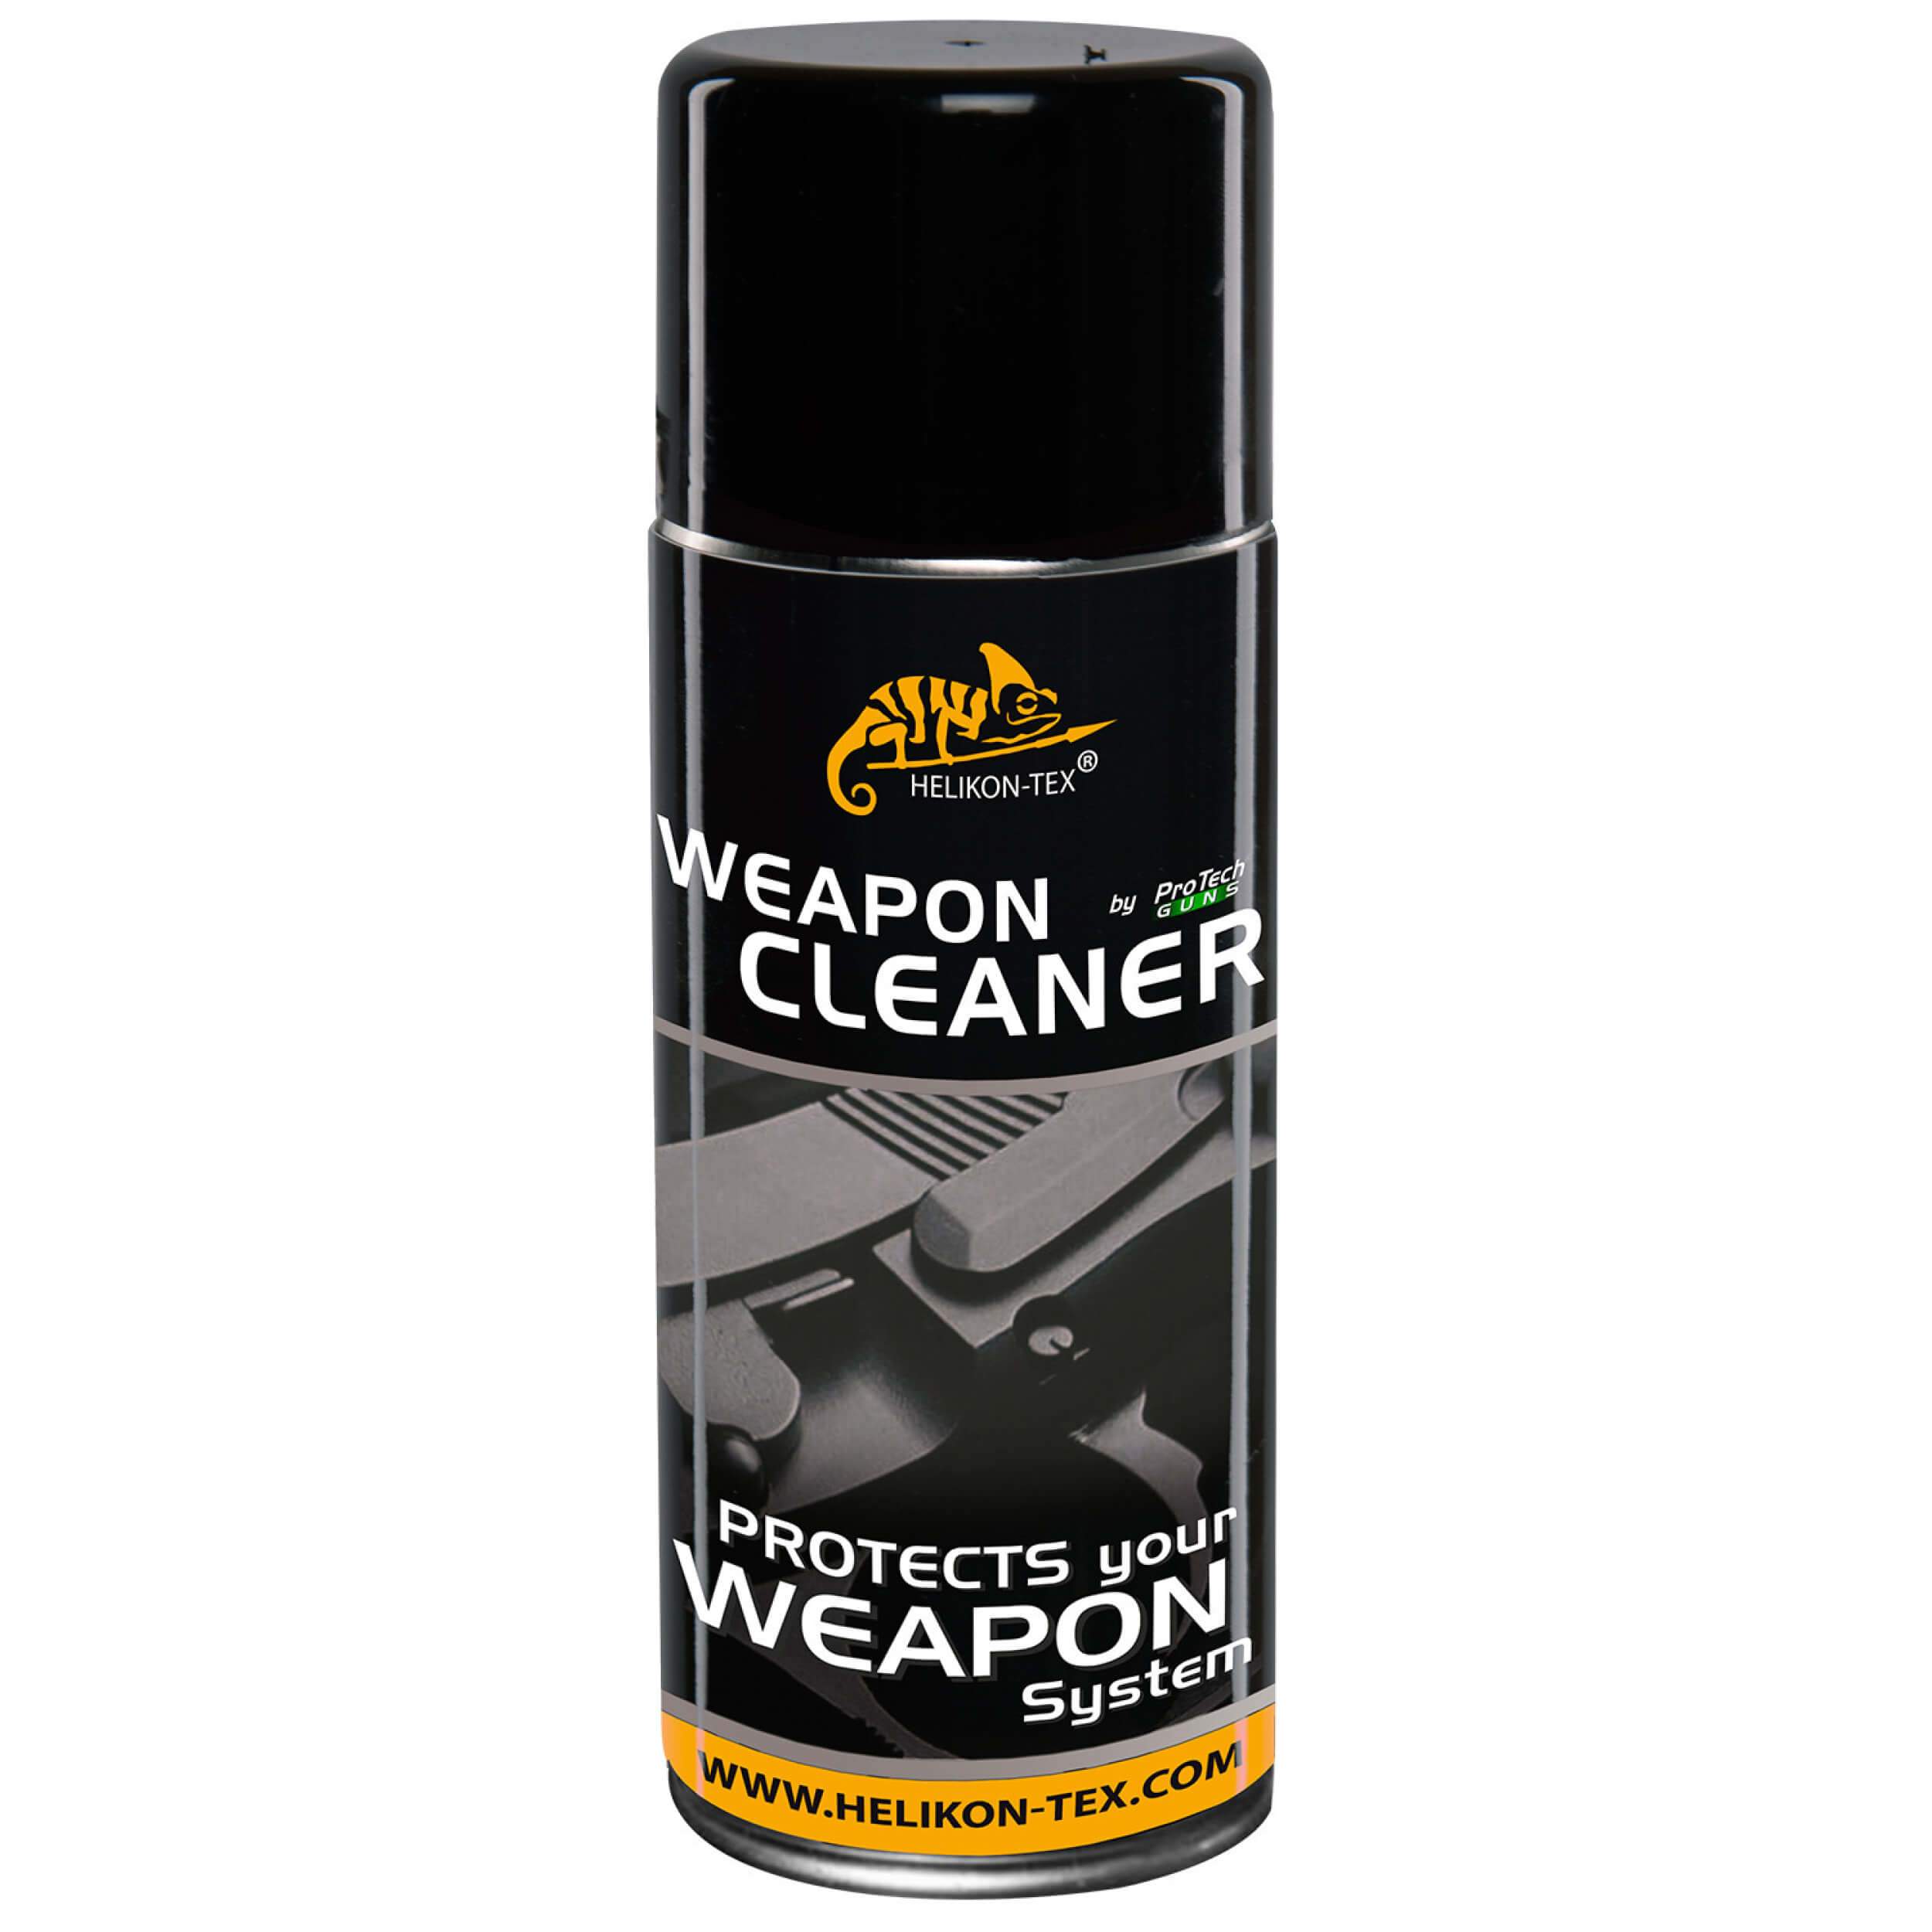 Helikon-Tex Weapon Cleaner 400ml (aerosol)